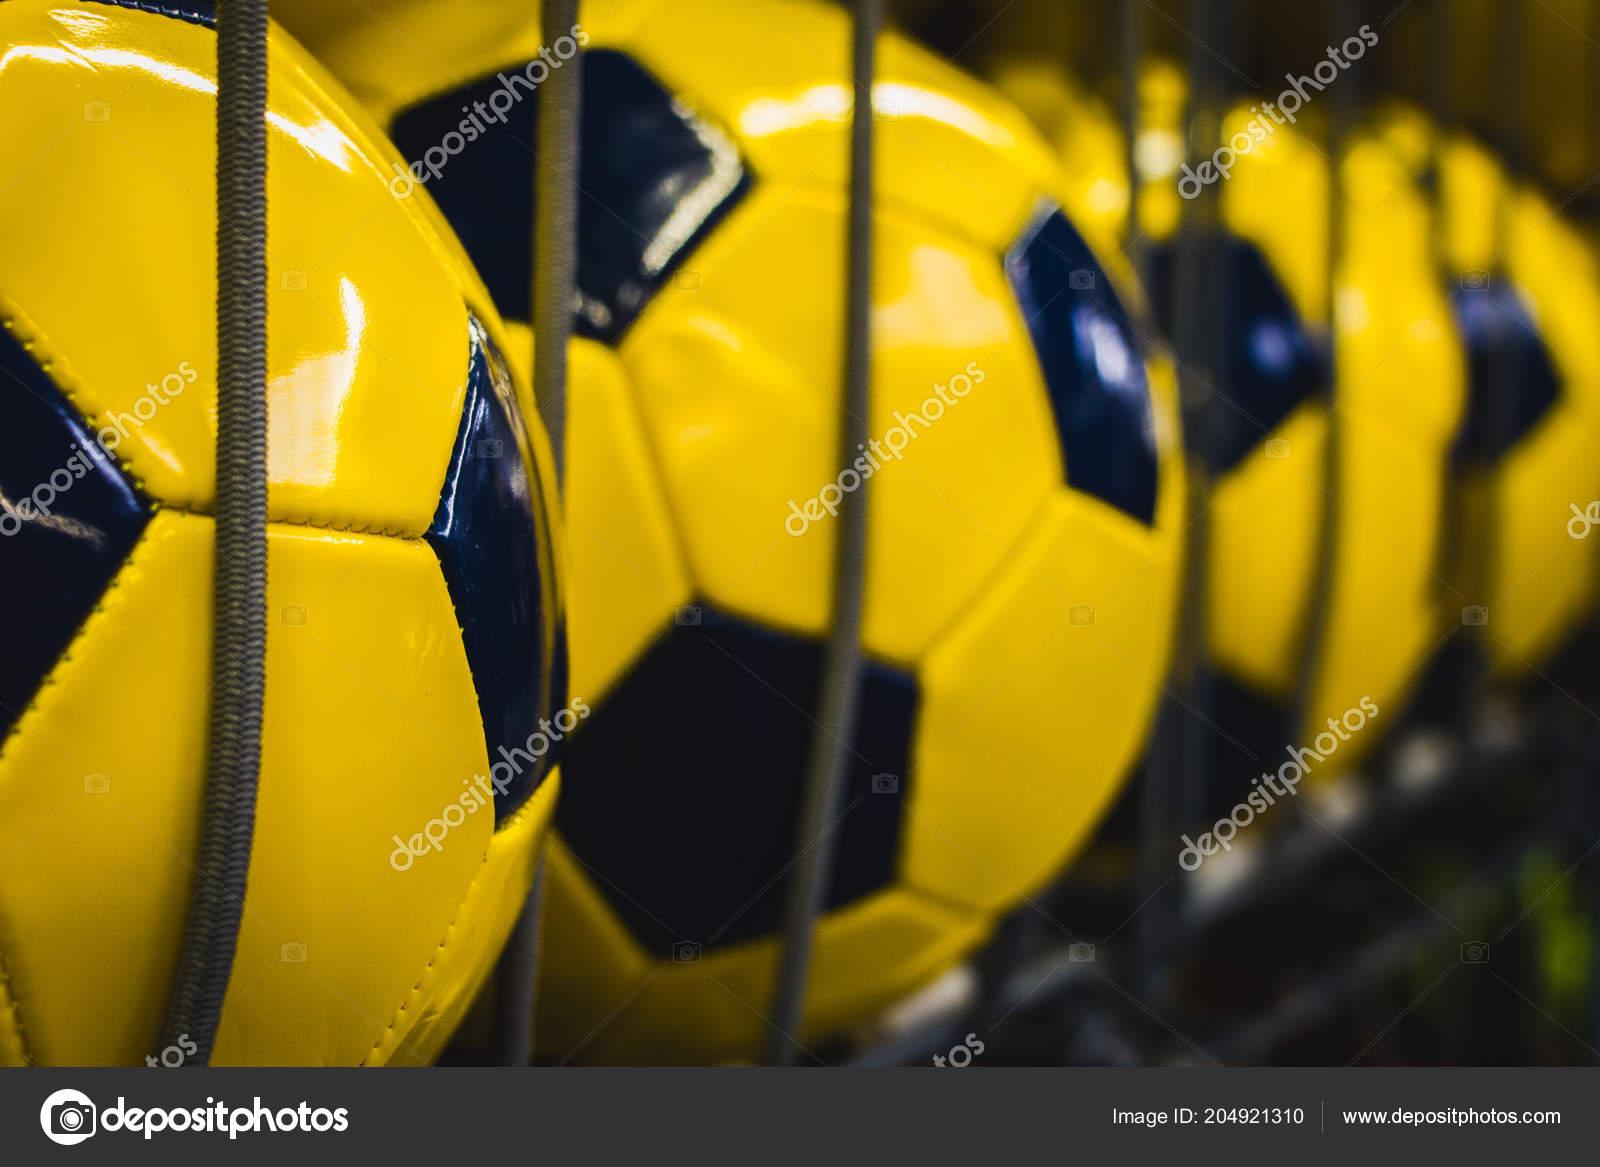 d92e1d3bb Tienda Deporte Grupo Balones Fútbol Amarillo Nuevo — Foto de stock ...